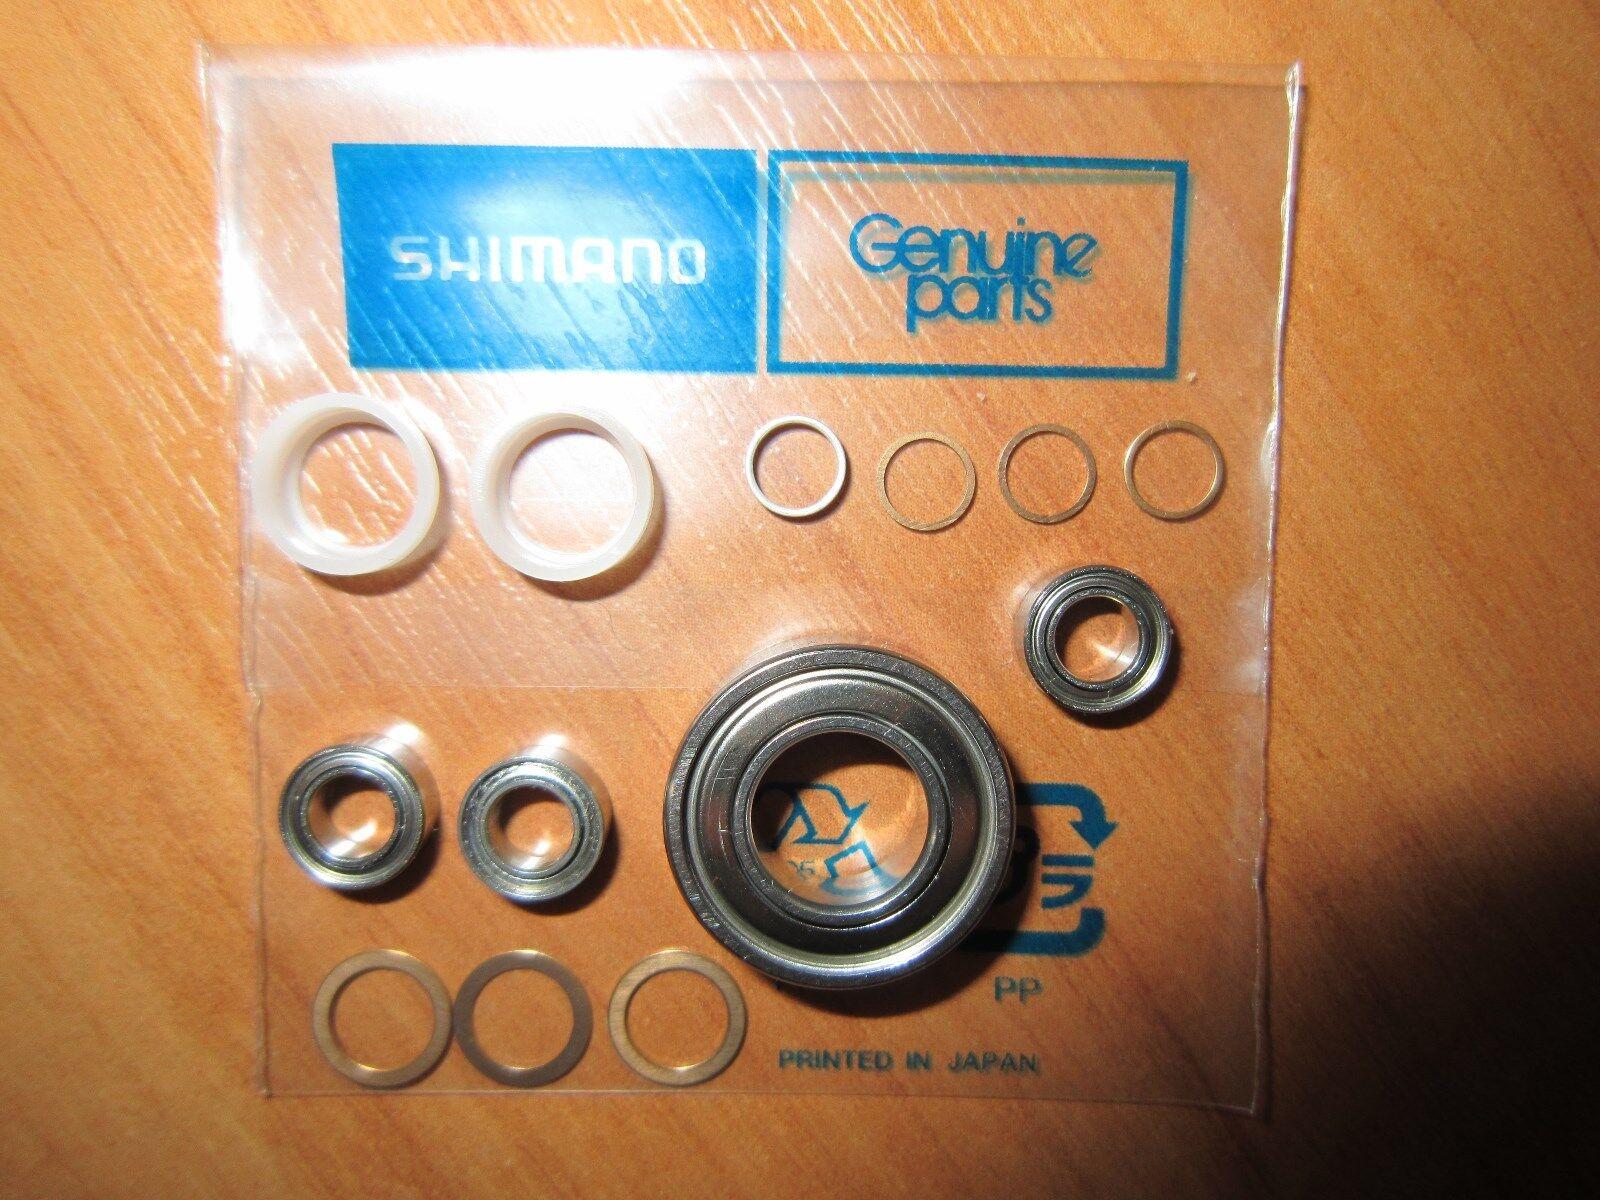 Shimano Exsence BB 4000 Line Roller Handle Handle Handle Knob Drag 4bb Kit 11 Exsence BB 12 28c90c